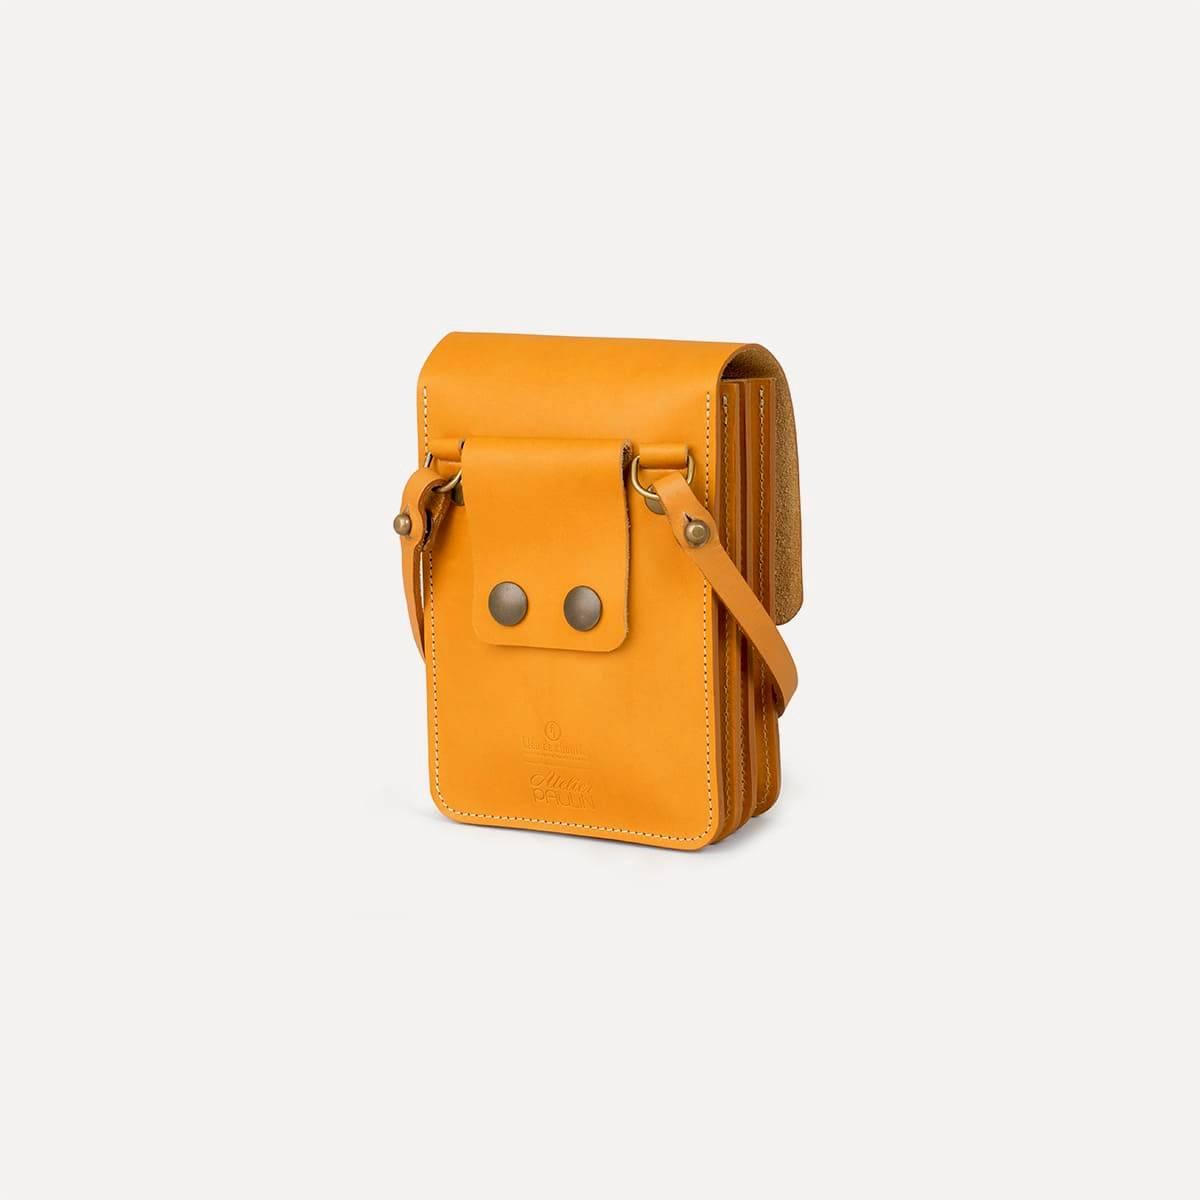 Jeweler's bag - BDC x Atelier Paulin (image n°6)